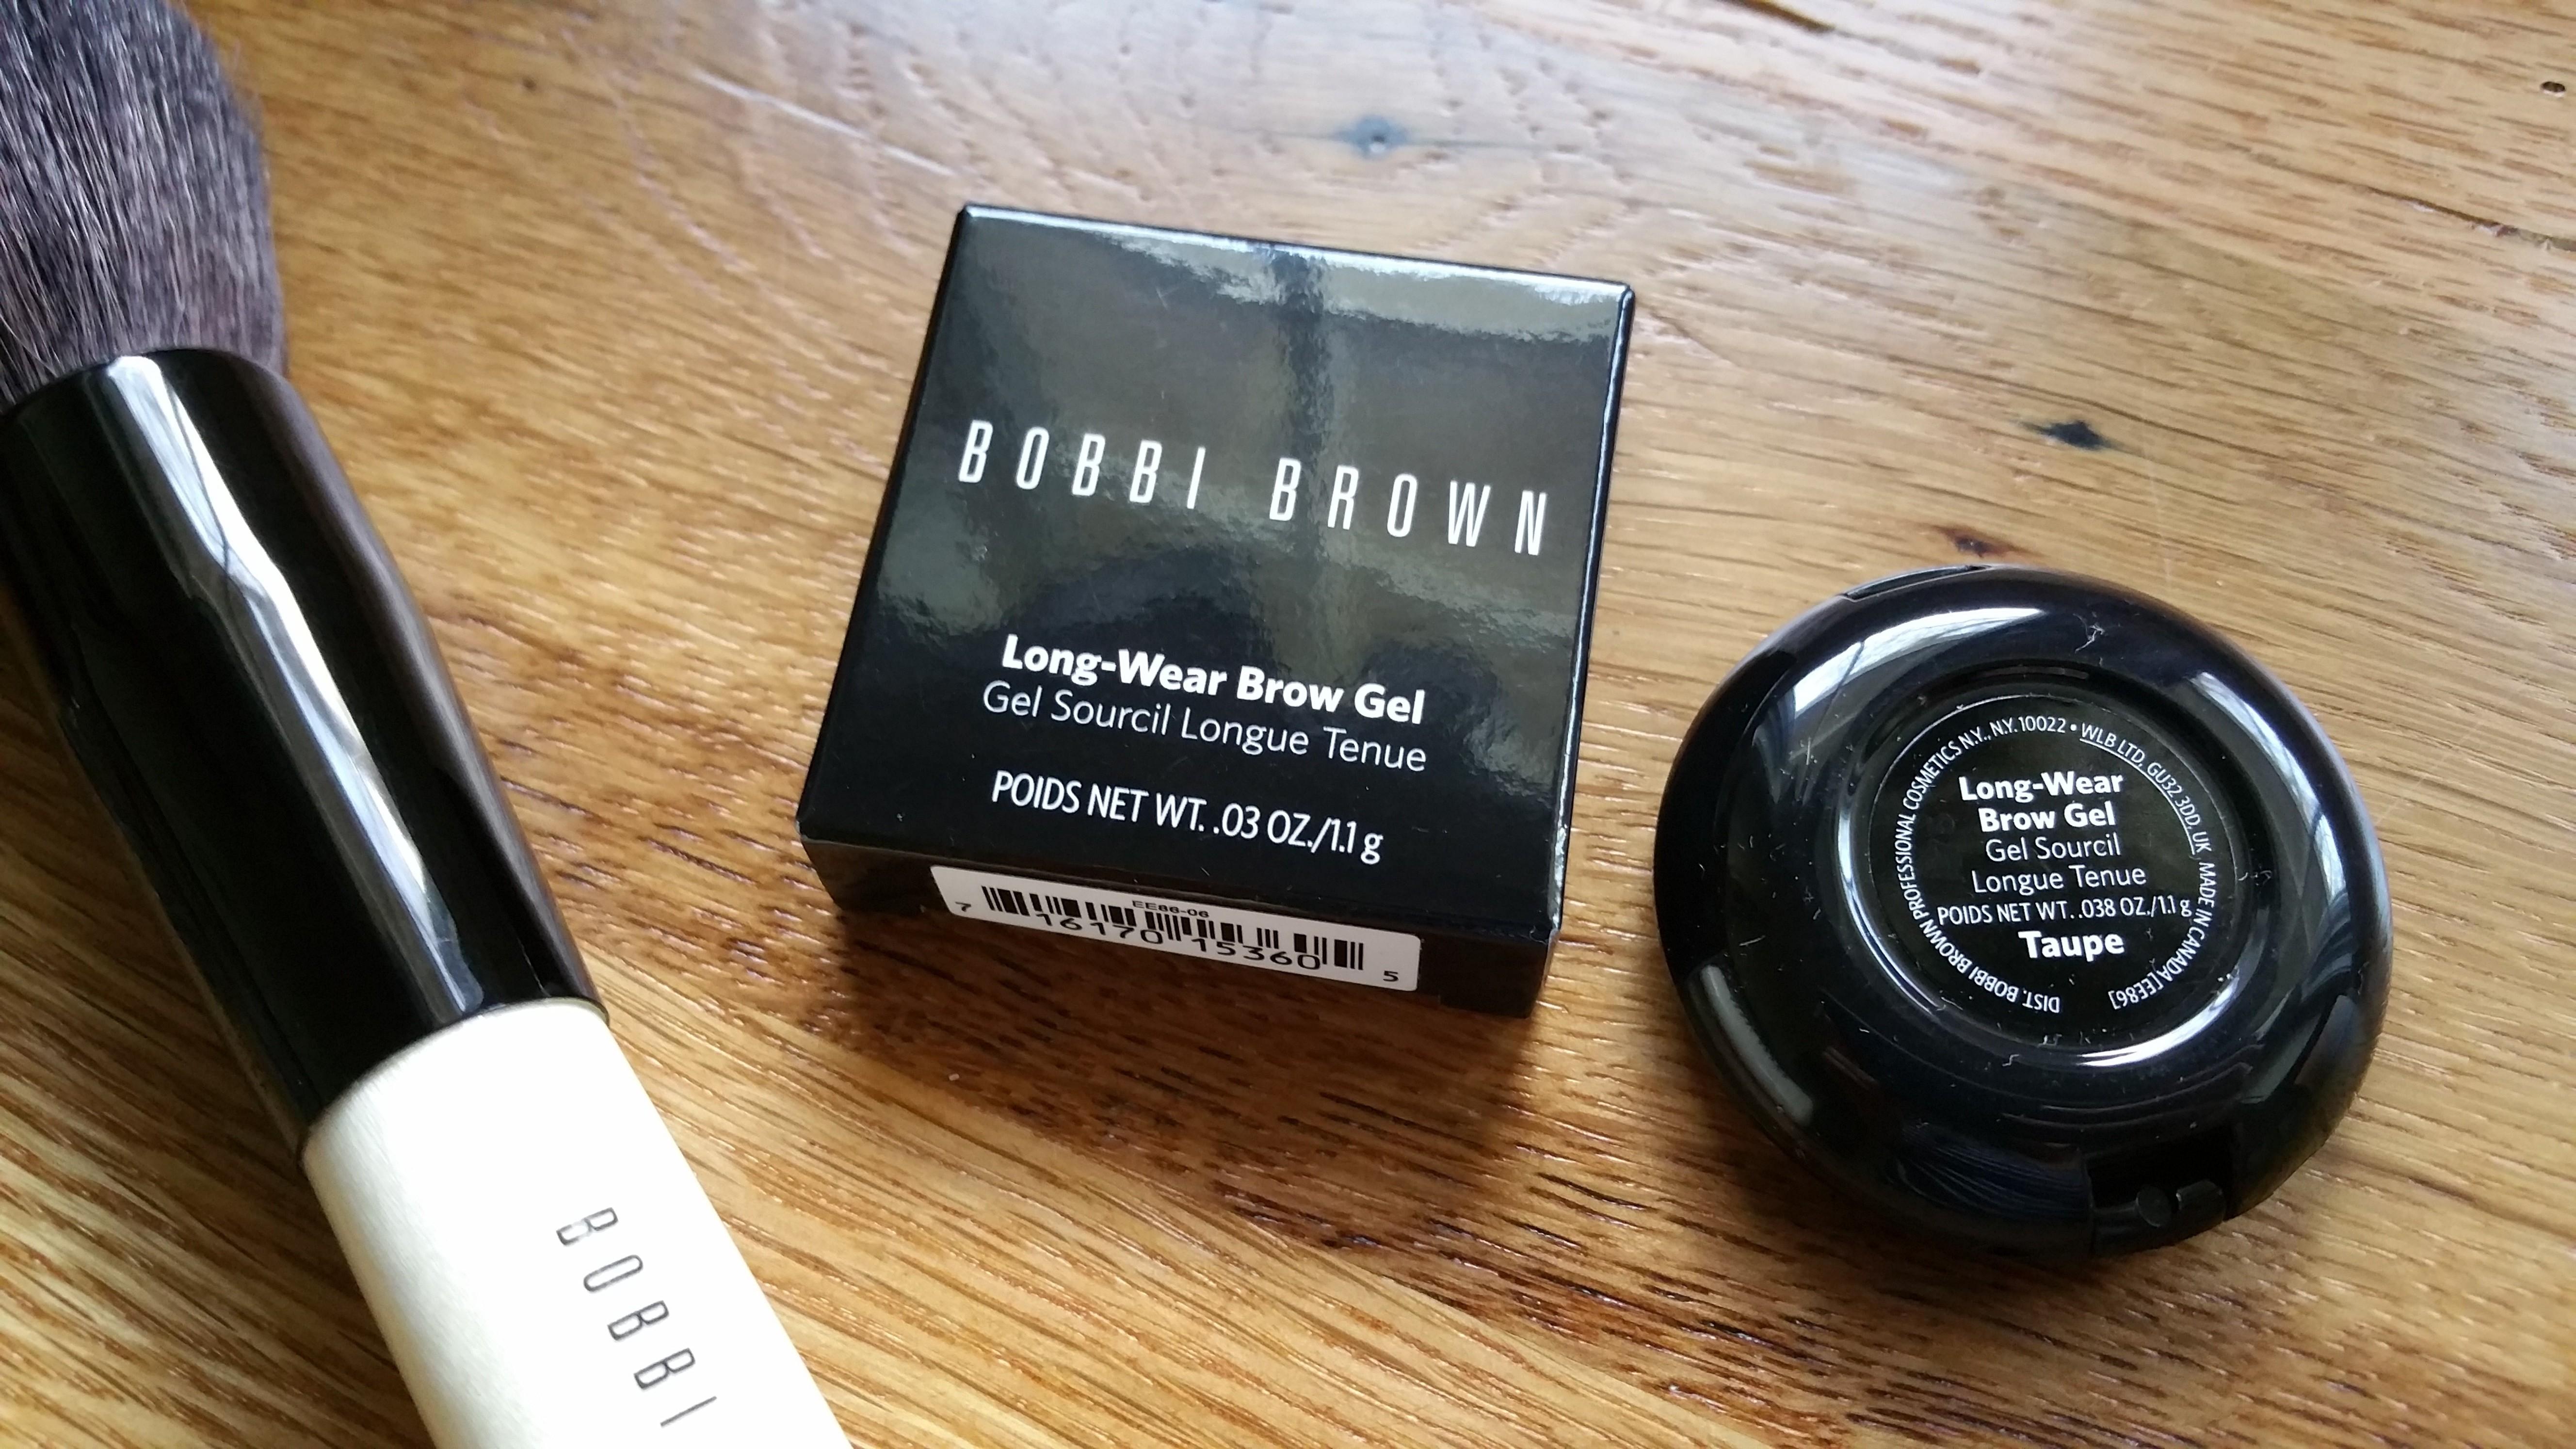 Bobbi Brown Cosmetics NEW Long-Wear Brow Gel for Eyebrows ...